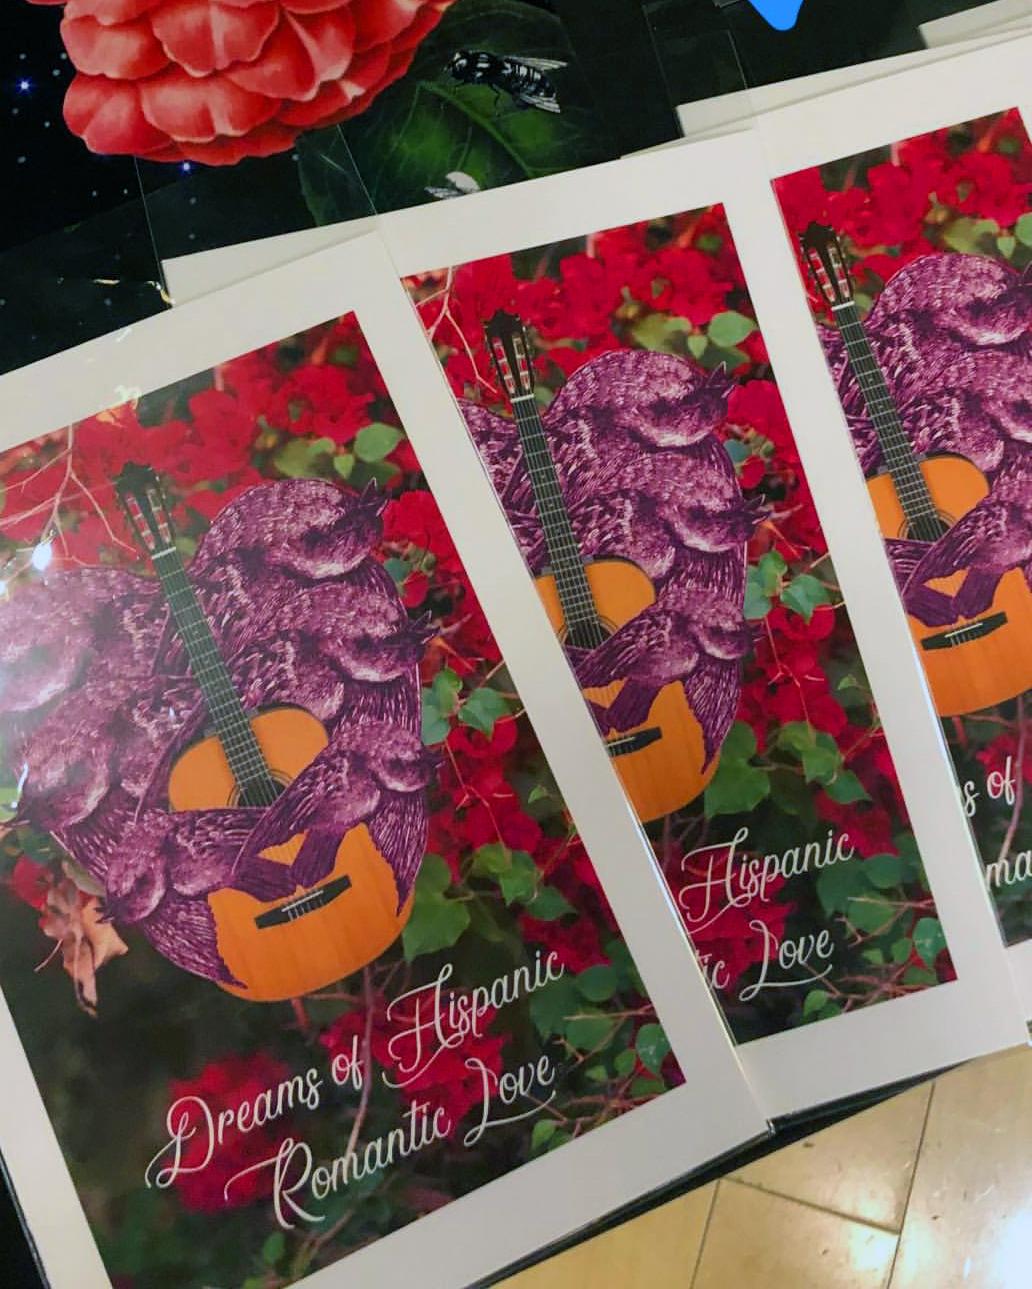 Zine Dreams of Hispanic Romantic Love